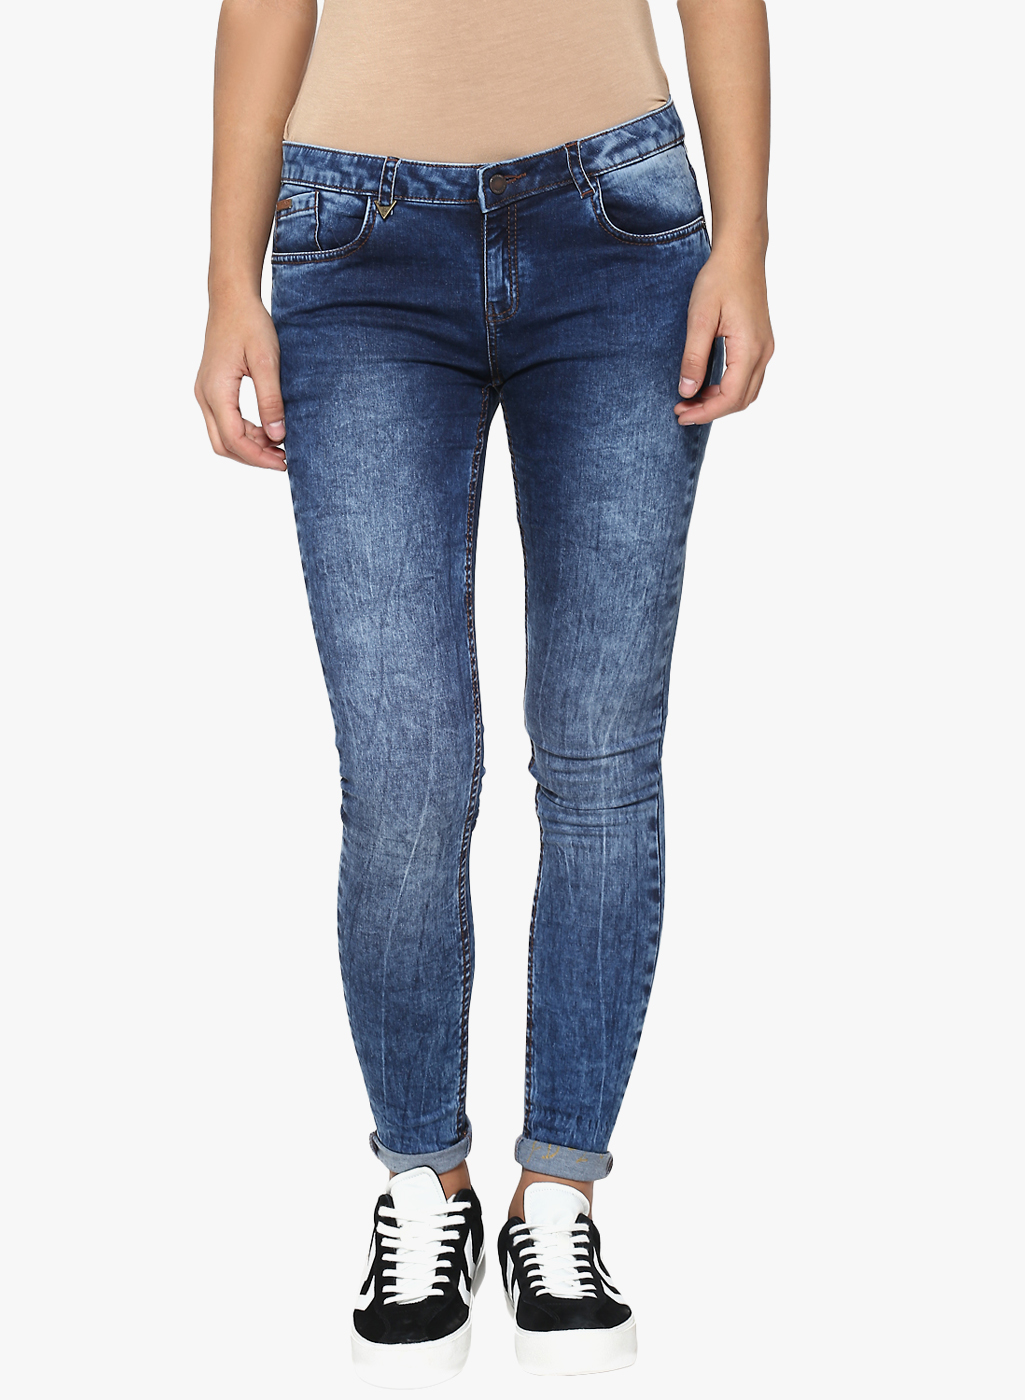 Crimsoune Club   Crimsoune Club Women's Solid Blue Jeans